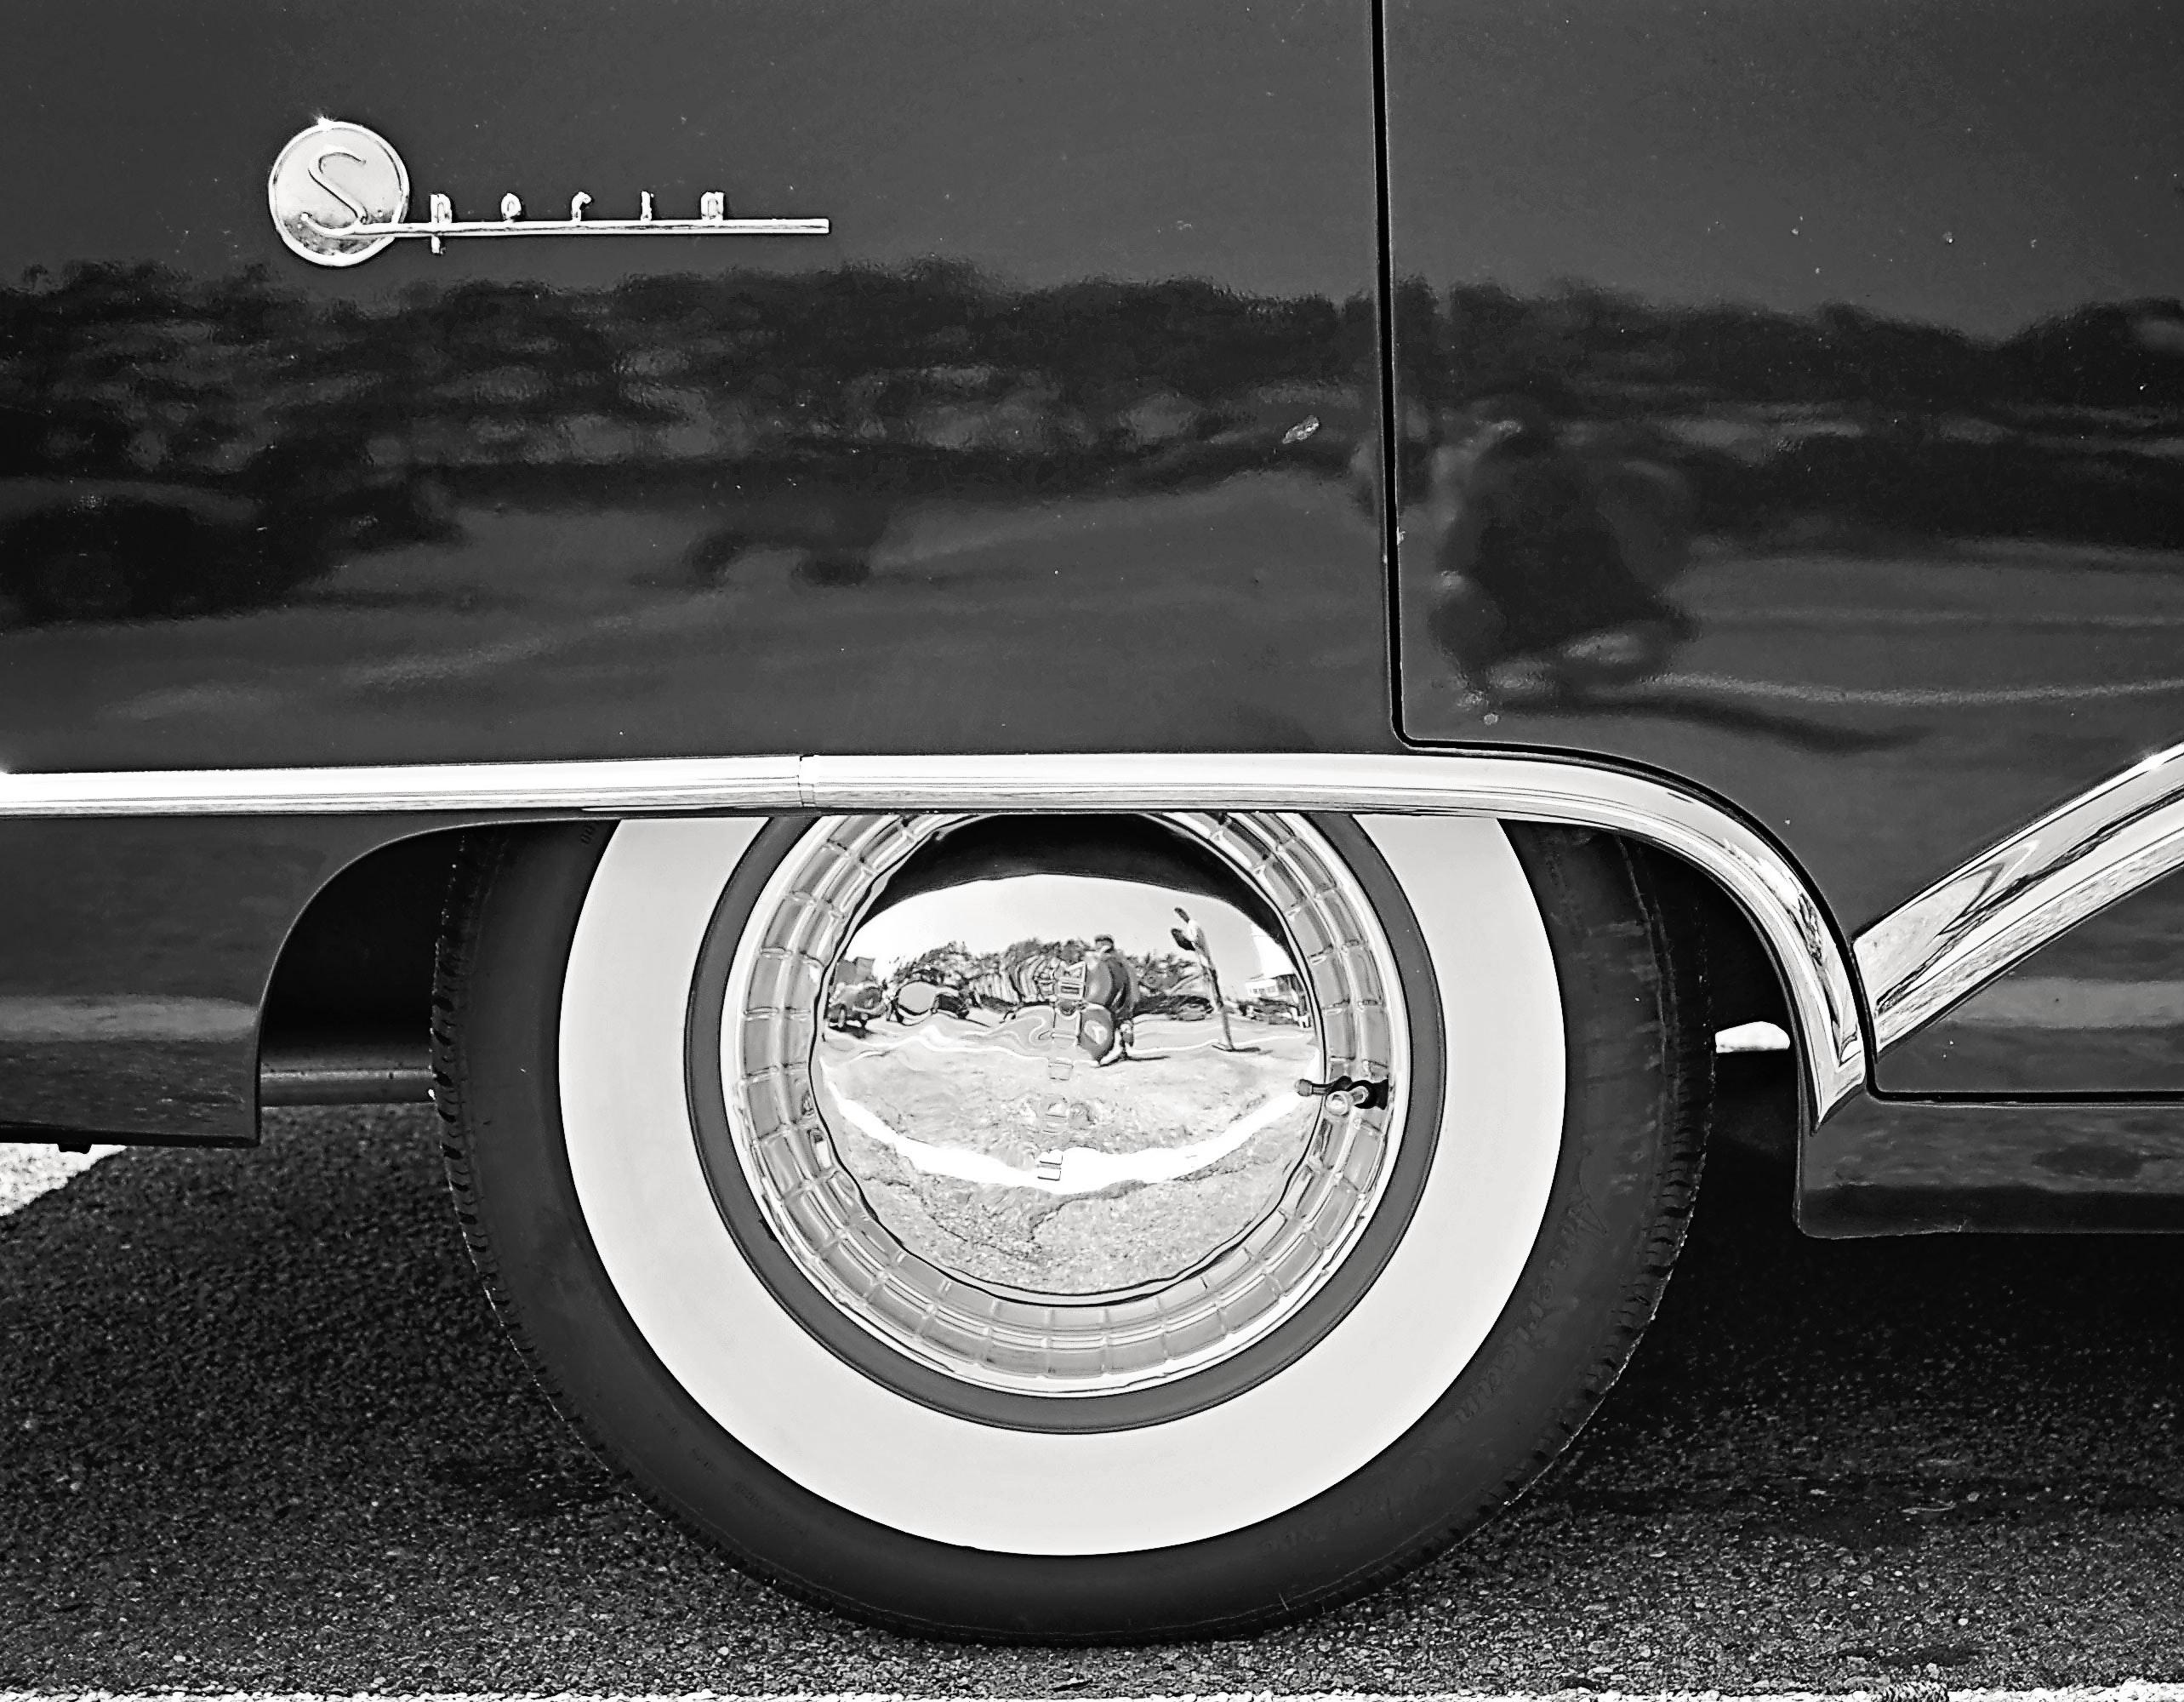 Black and White Car Wheel, Asphalt, Shiny, Vintage, Vehicle, HQ Photo